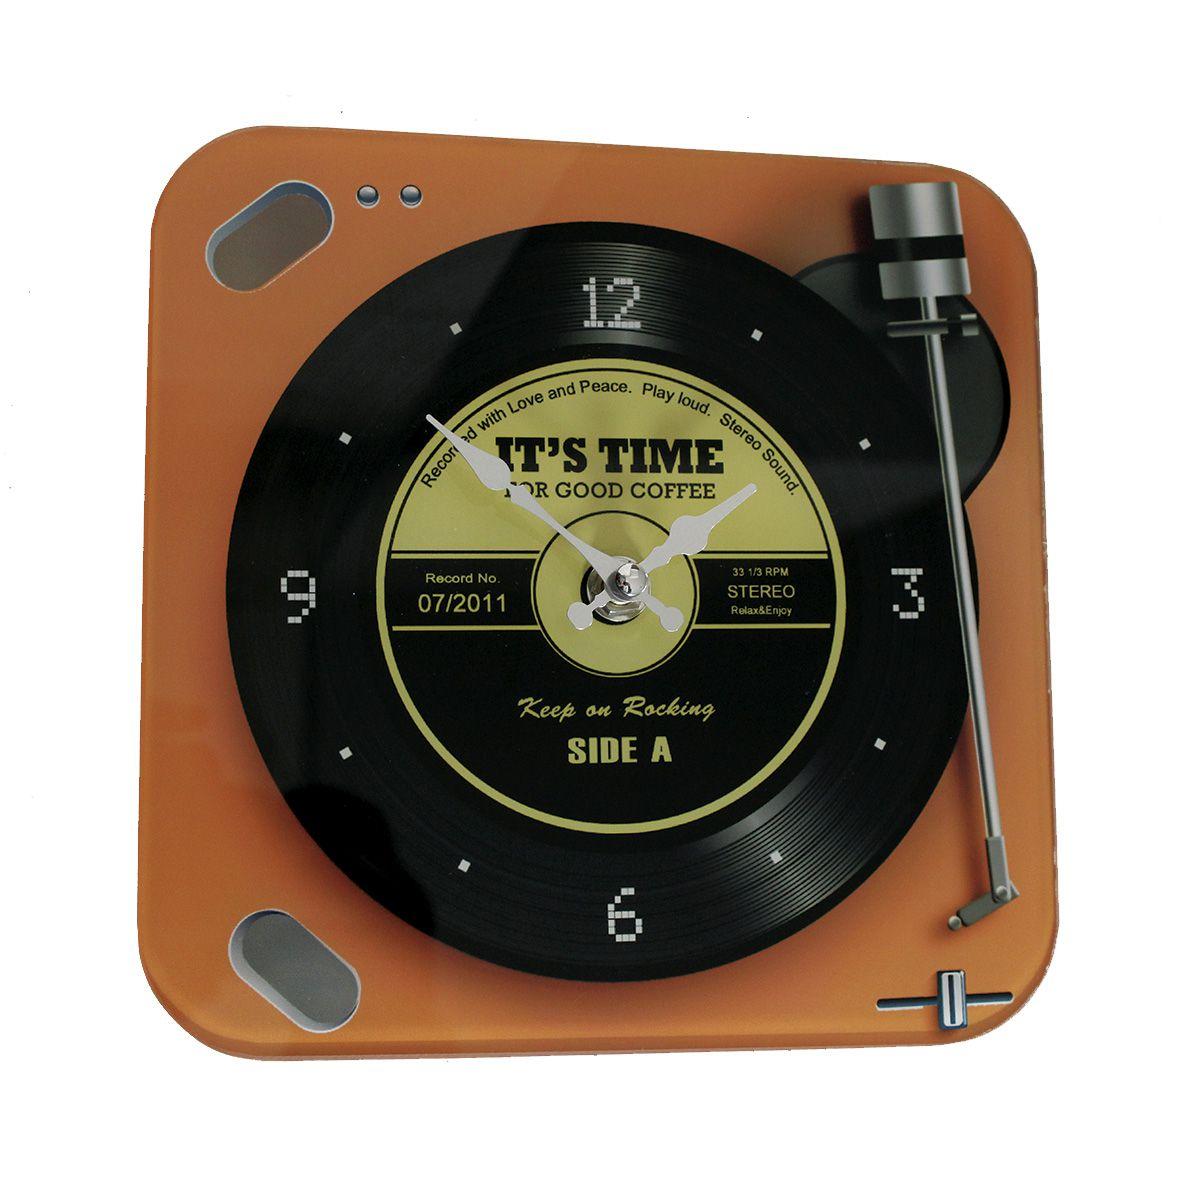 Relógio de Parede de Retrô Mod Vinil For Good Coffee - Orange 20x20cm